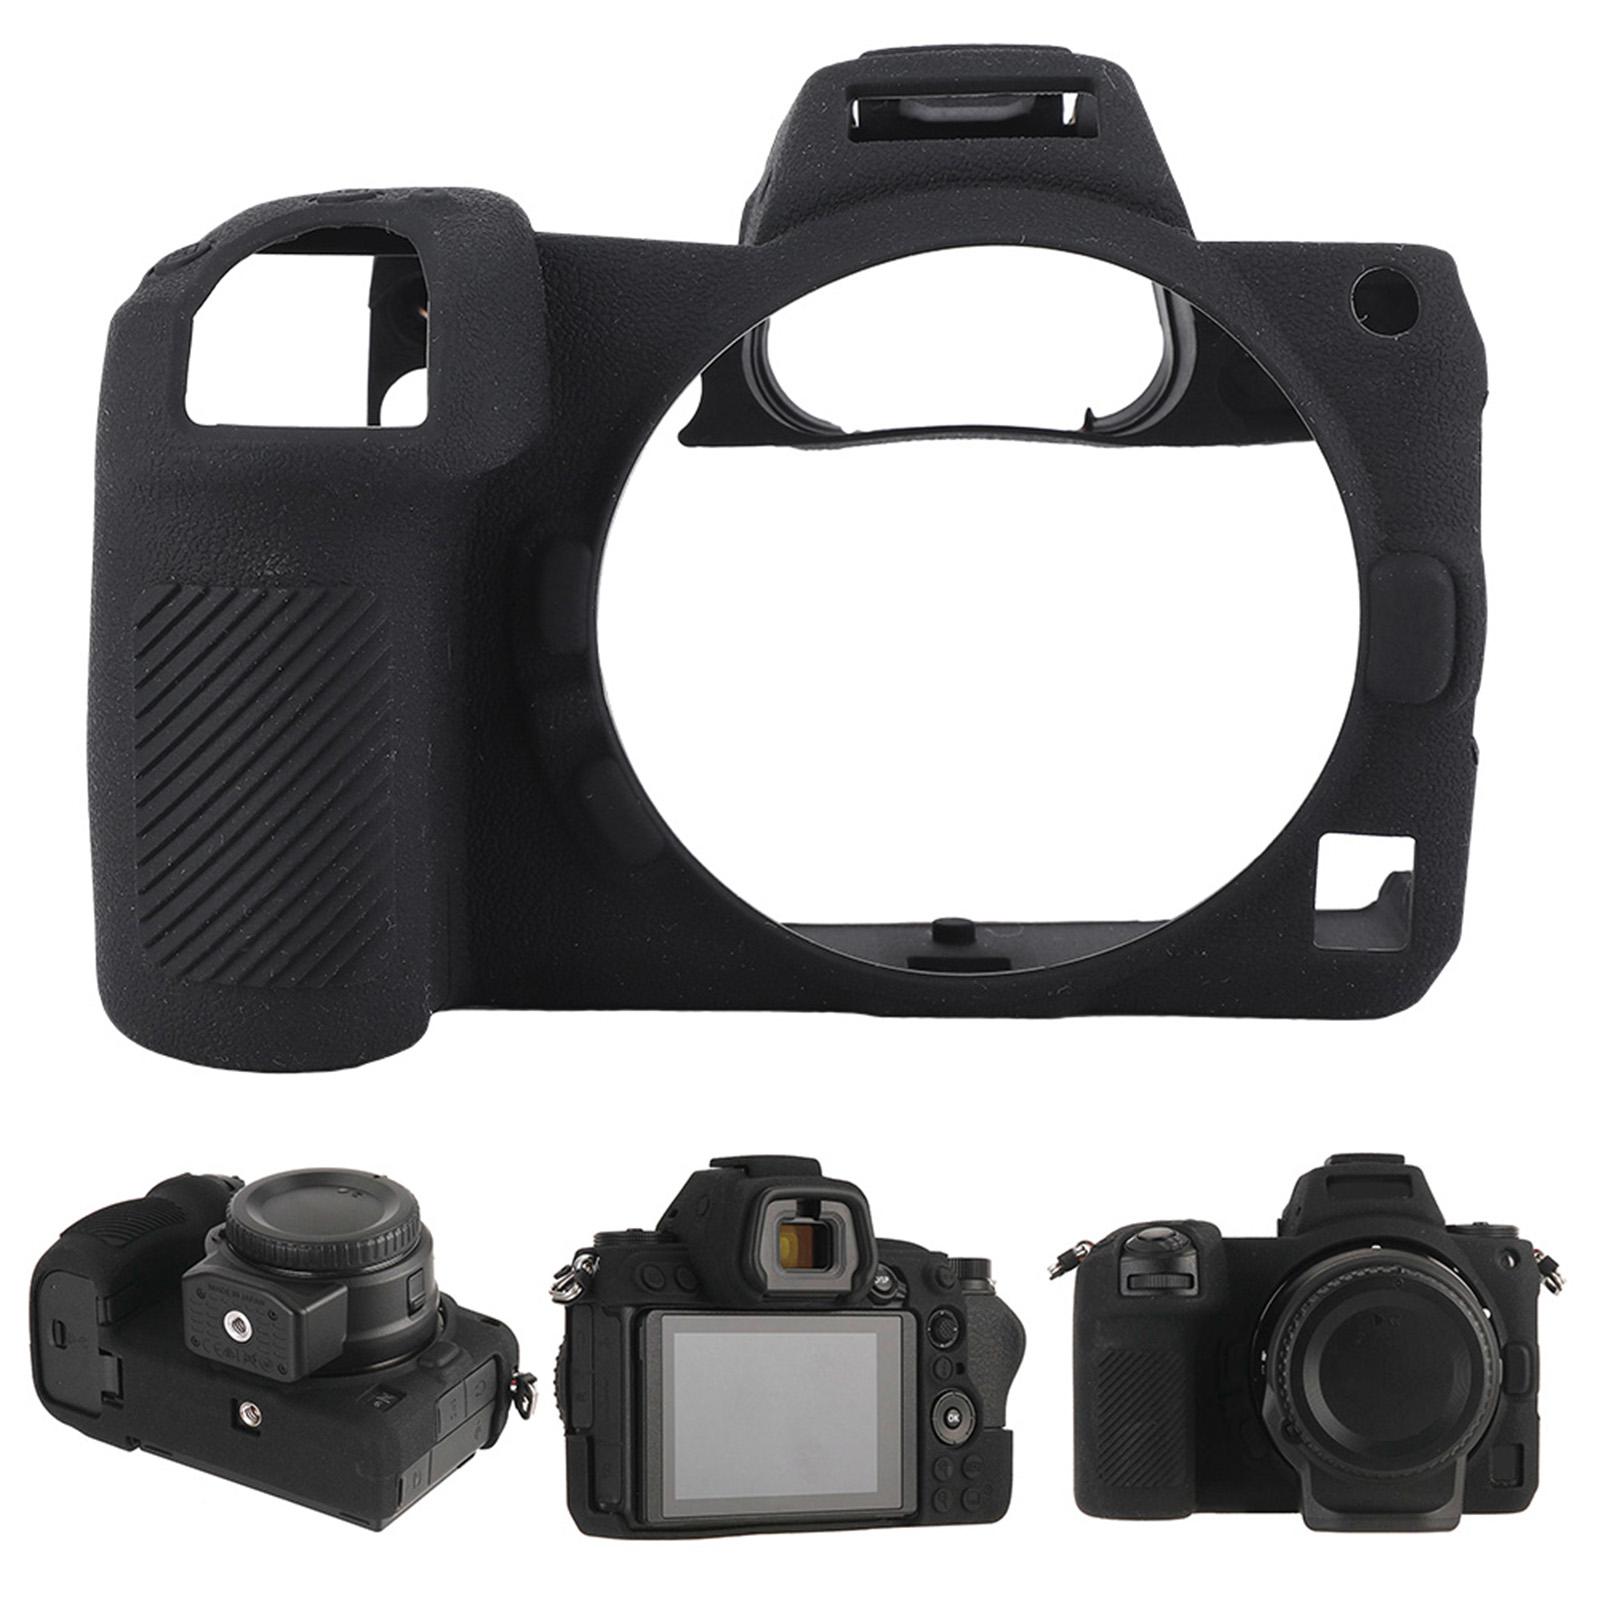 Funda-de-Silicona-Suave-a-Prueba-De-Golpes-Funda-Protectora-De-Camara-Para-Nikon-D5300-D7500-D3400 miniatura 36